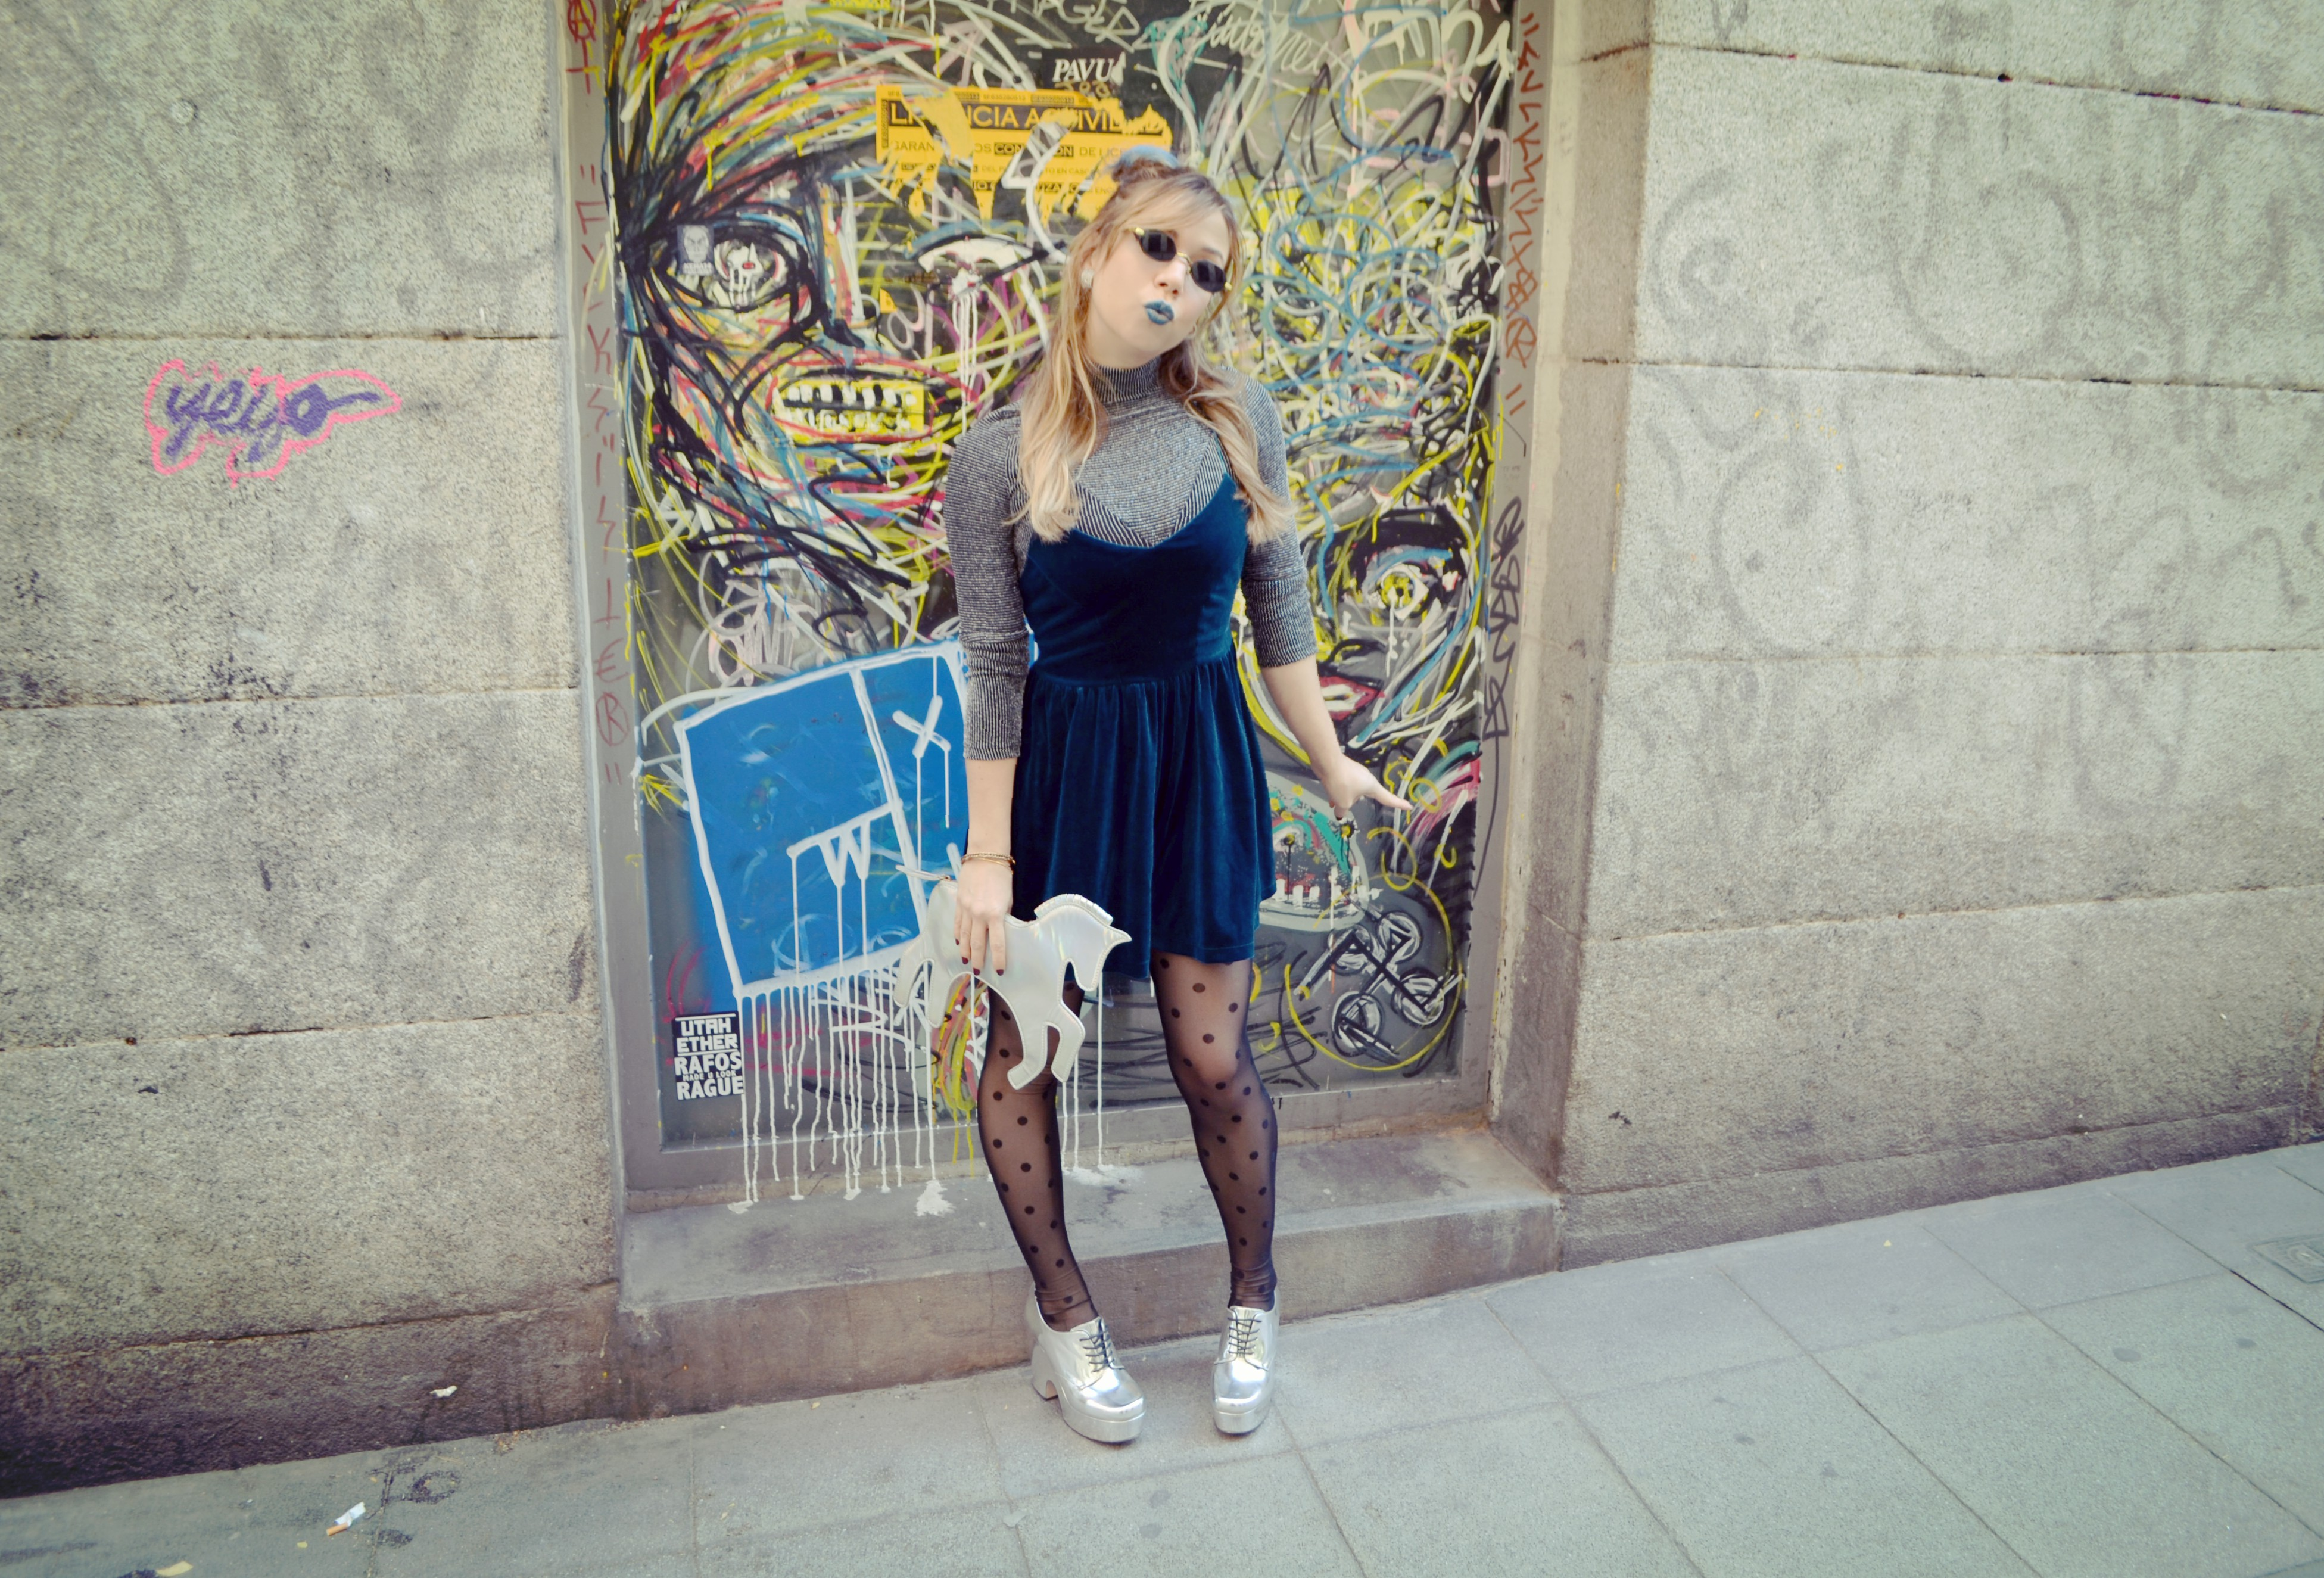 Blog-de-moda-ChicAdicta-fashionista-Chic-Adicta-influencer-Madrid-look-con-mono-romwe-jumpsuit-nyx-lipstick-PiensaenChic-Piensa-en-Chic